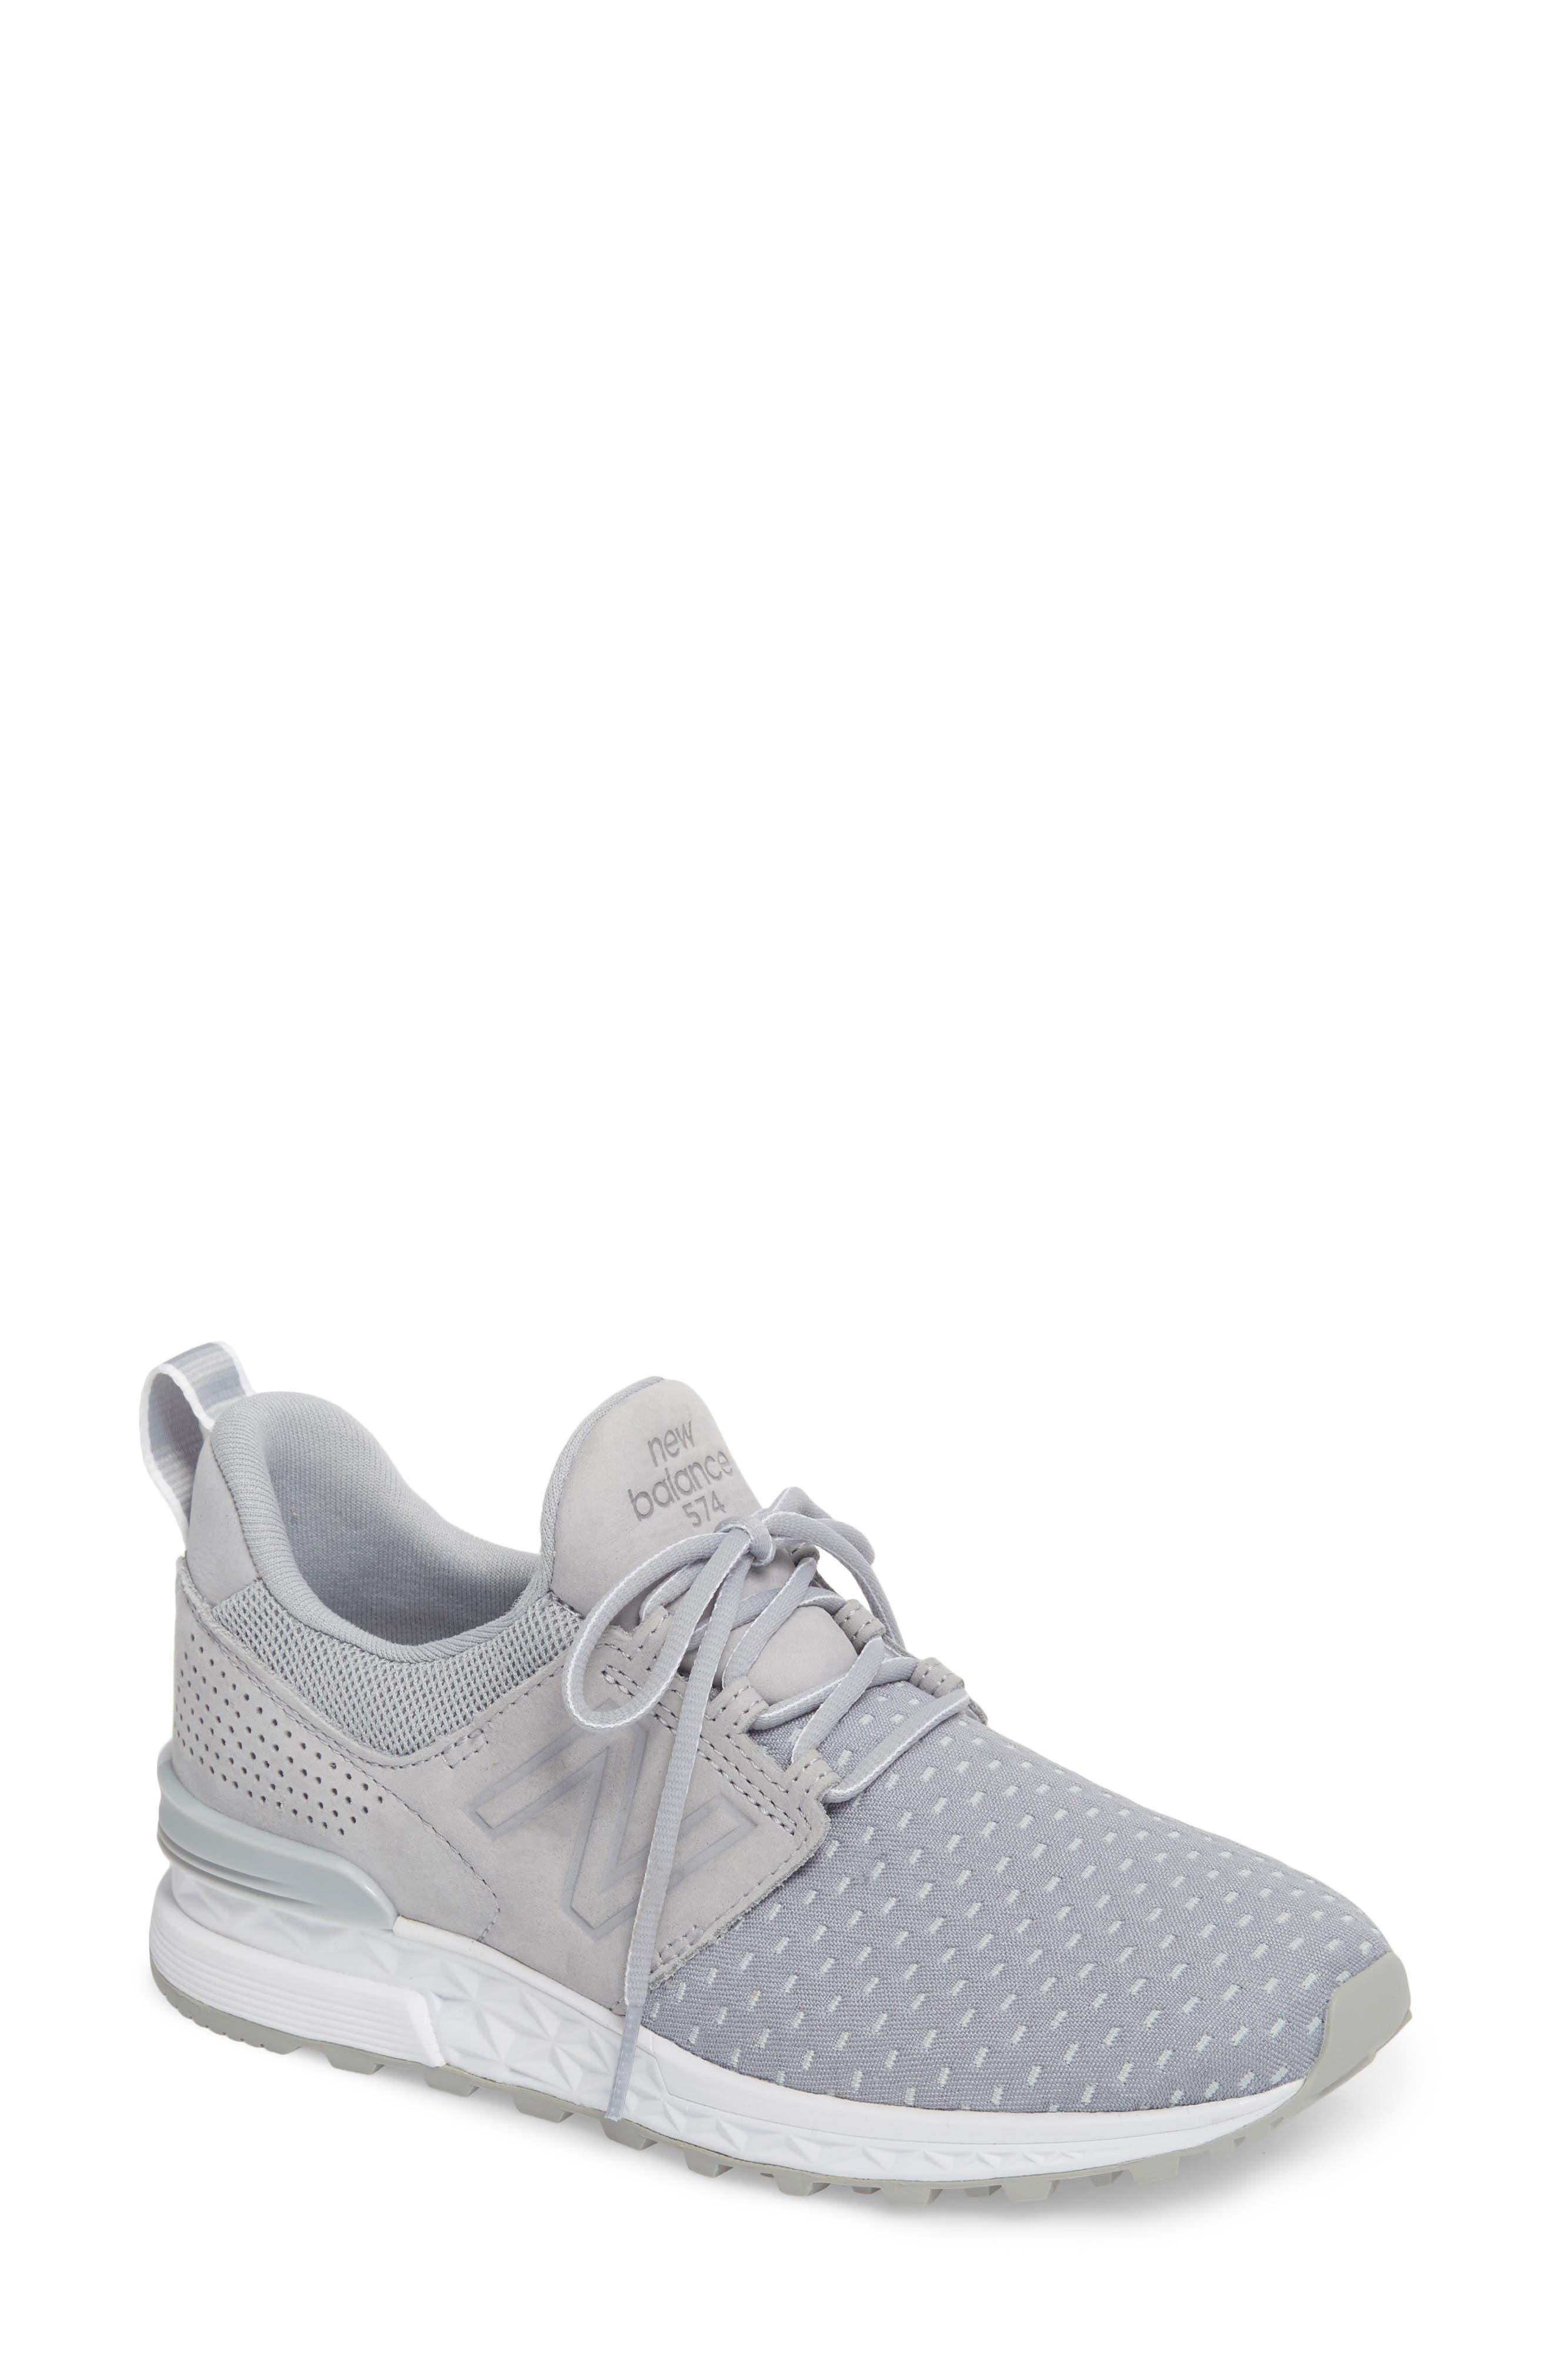 574 Sport Decon Fresh Foam Sneaker,                             Main thumbnail 1, color,                             097